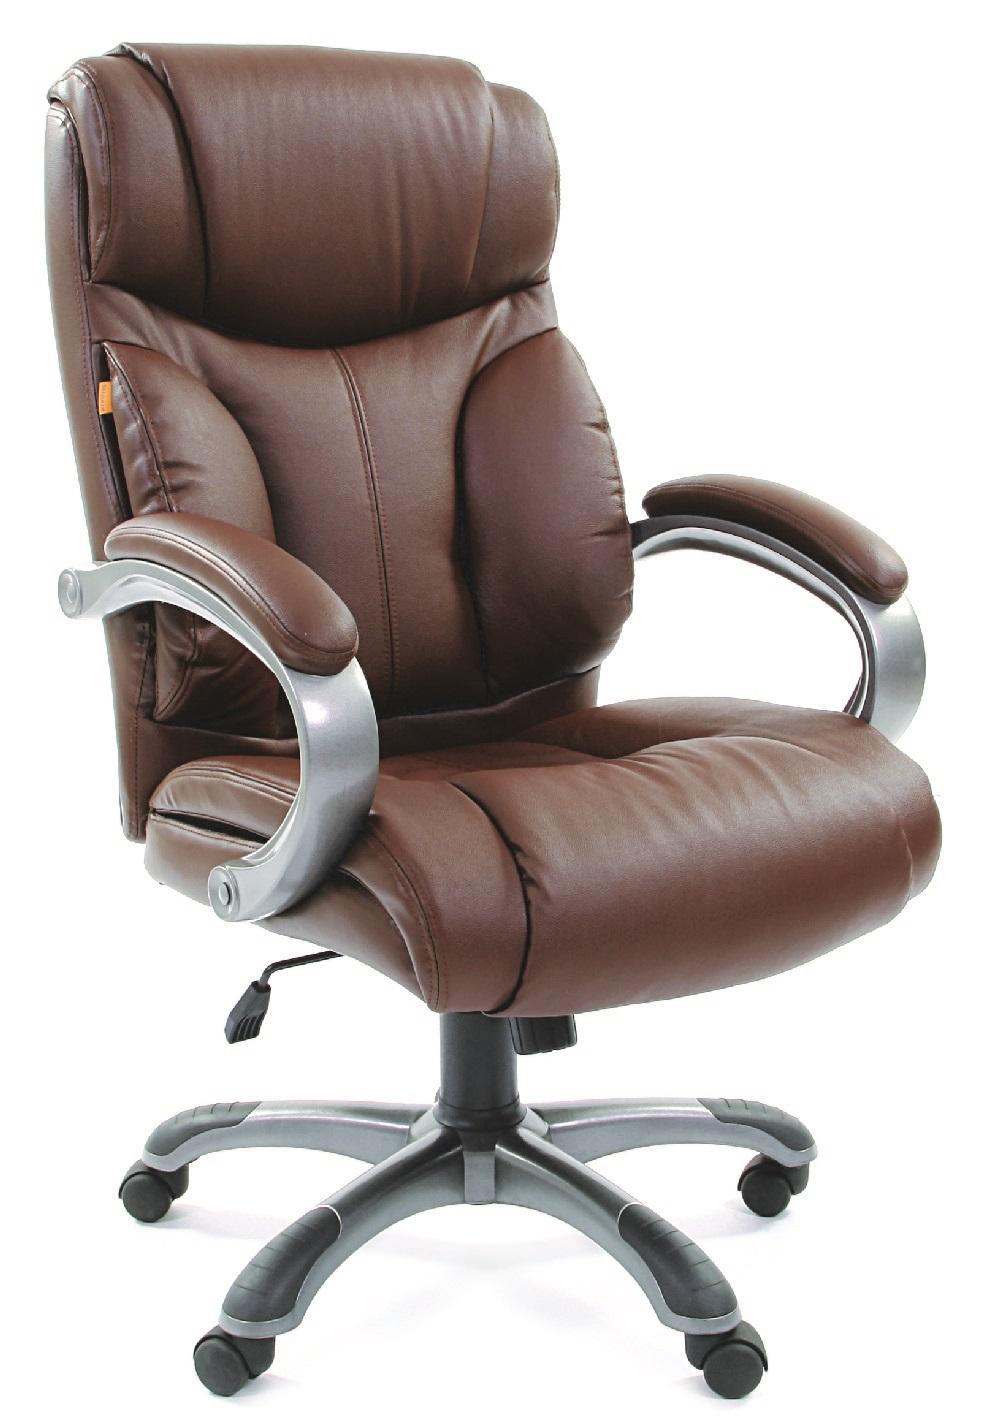 Кресло руководителя CH-435 коричневая кожа, Chairman 435